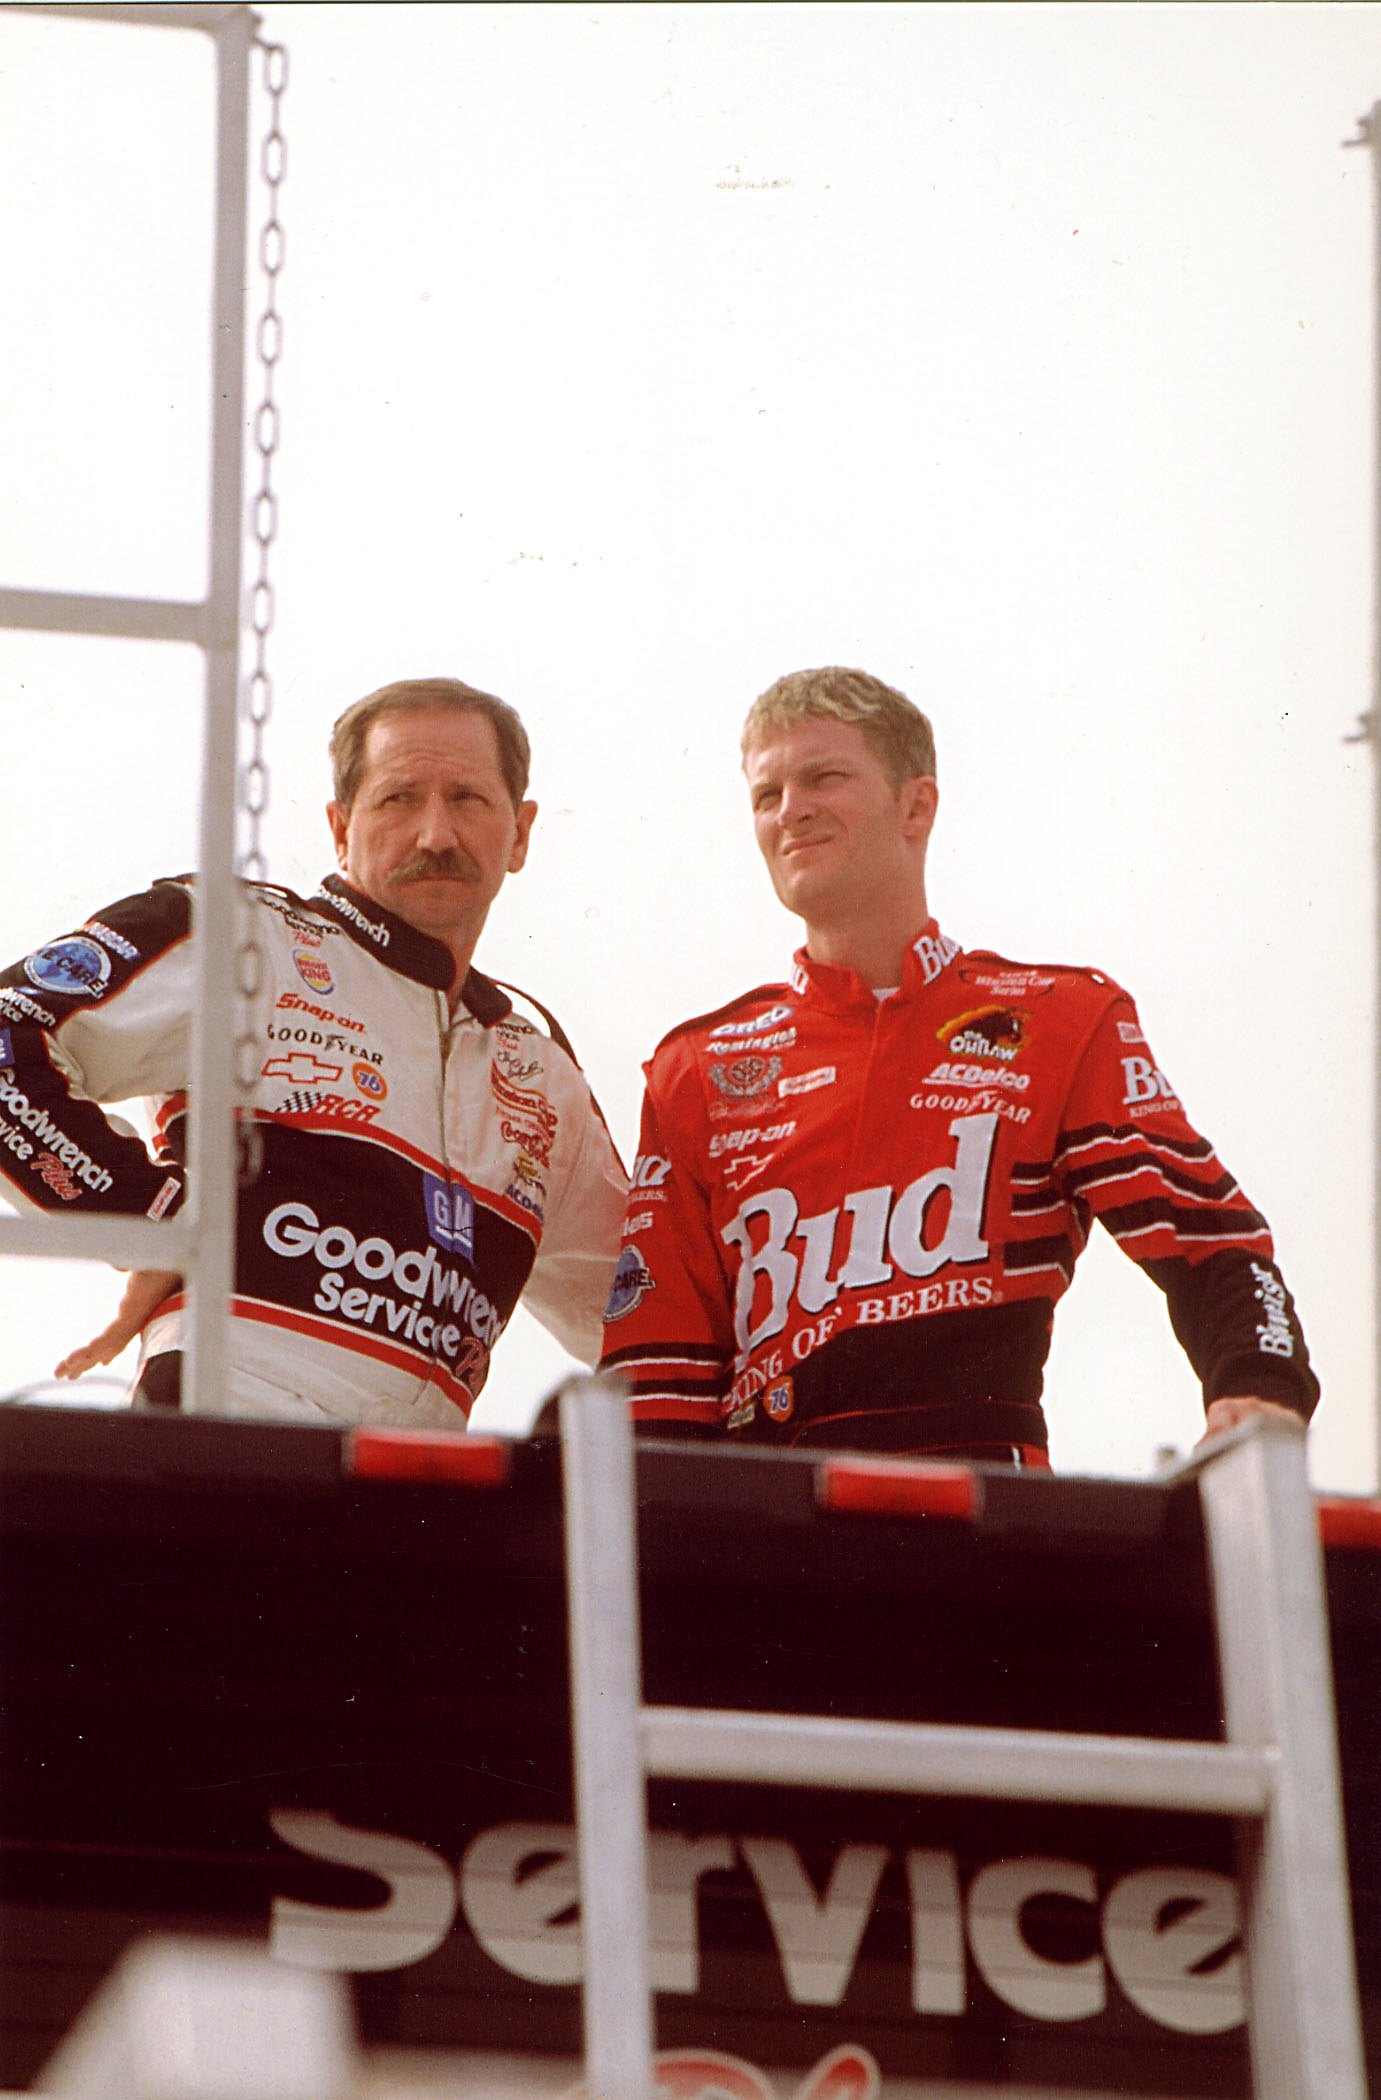 Dale Earnhardt Jr and Dale Earnhardt Sr